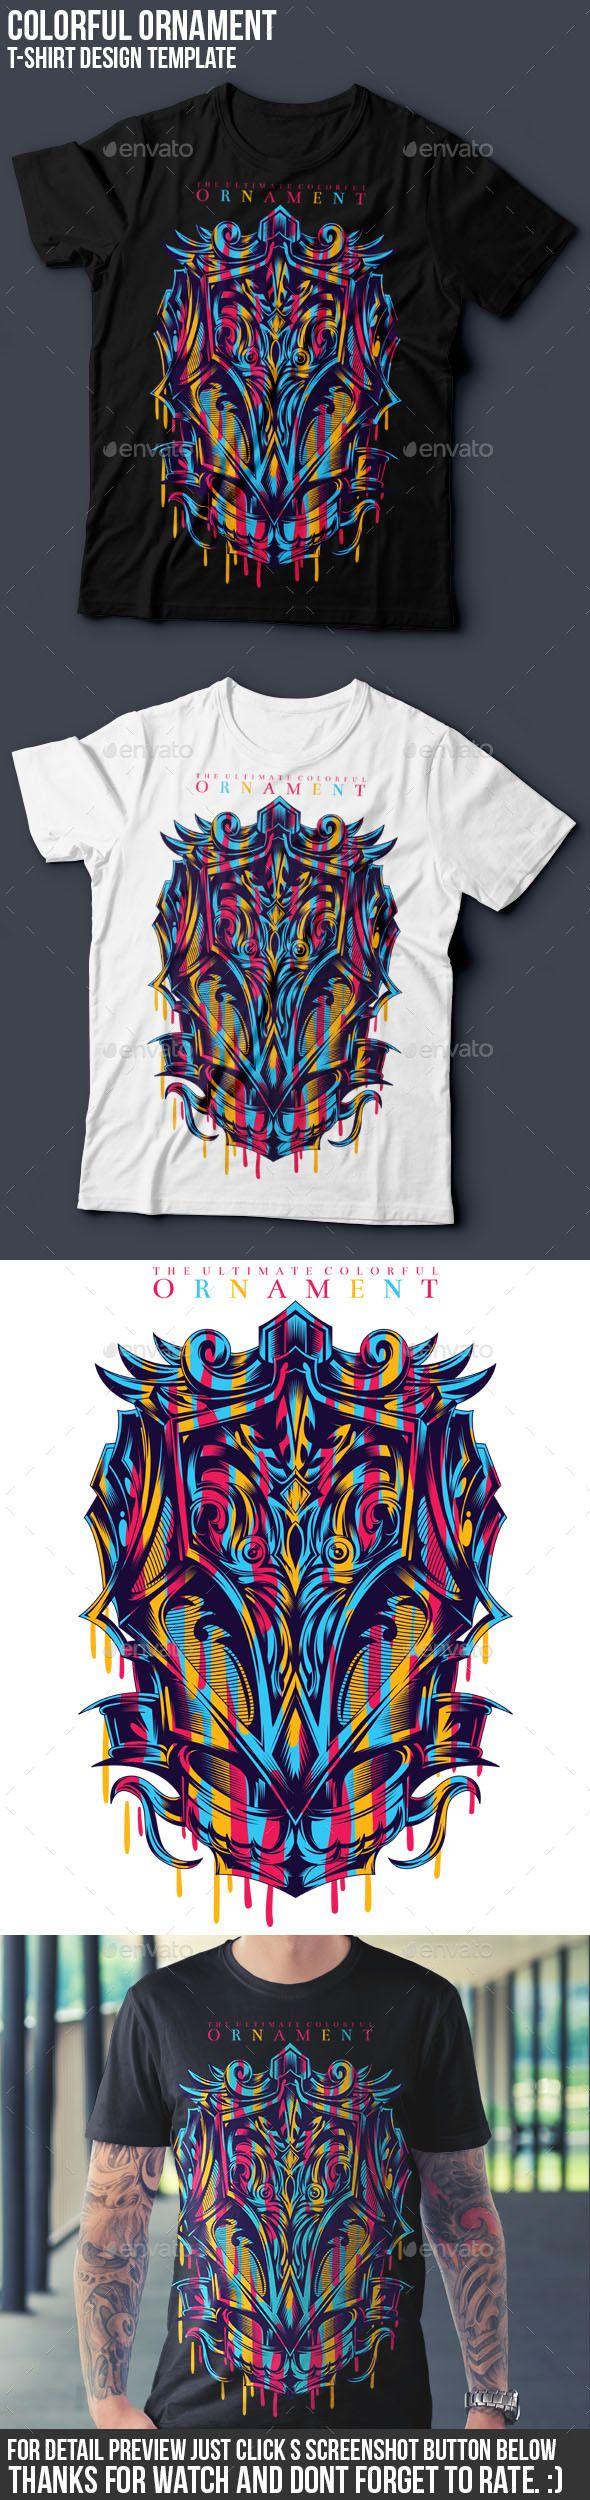 Shirt design resolution - Colorful Ornament T Shirt Design Clean Designs